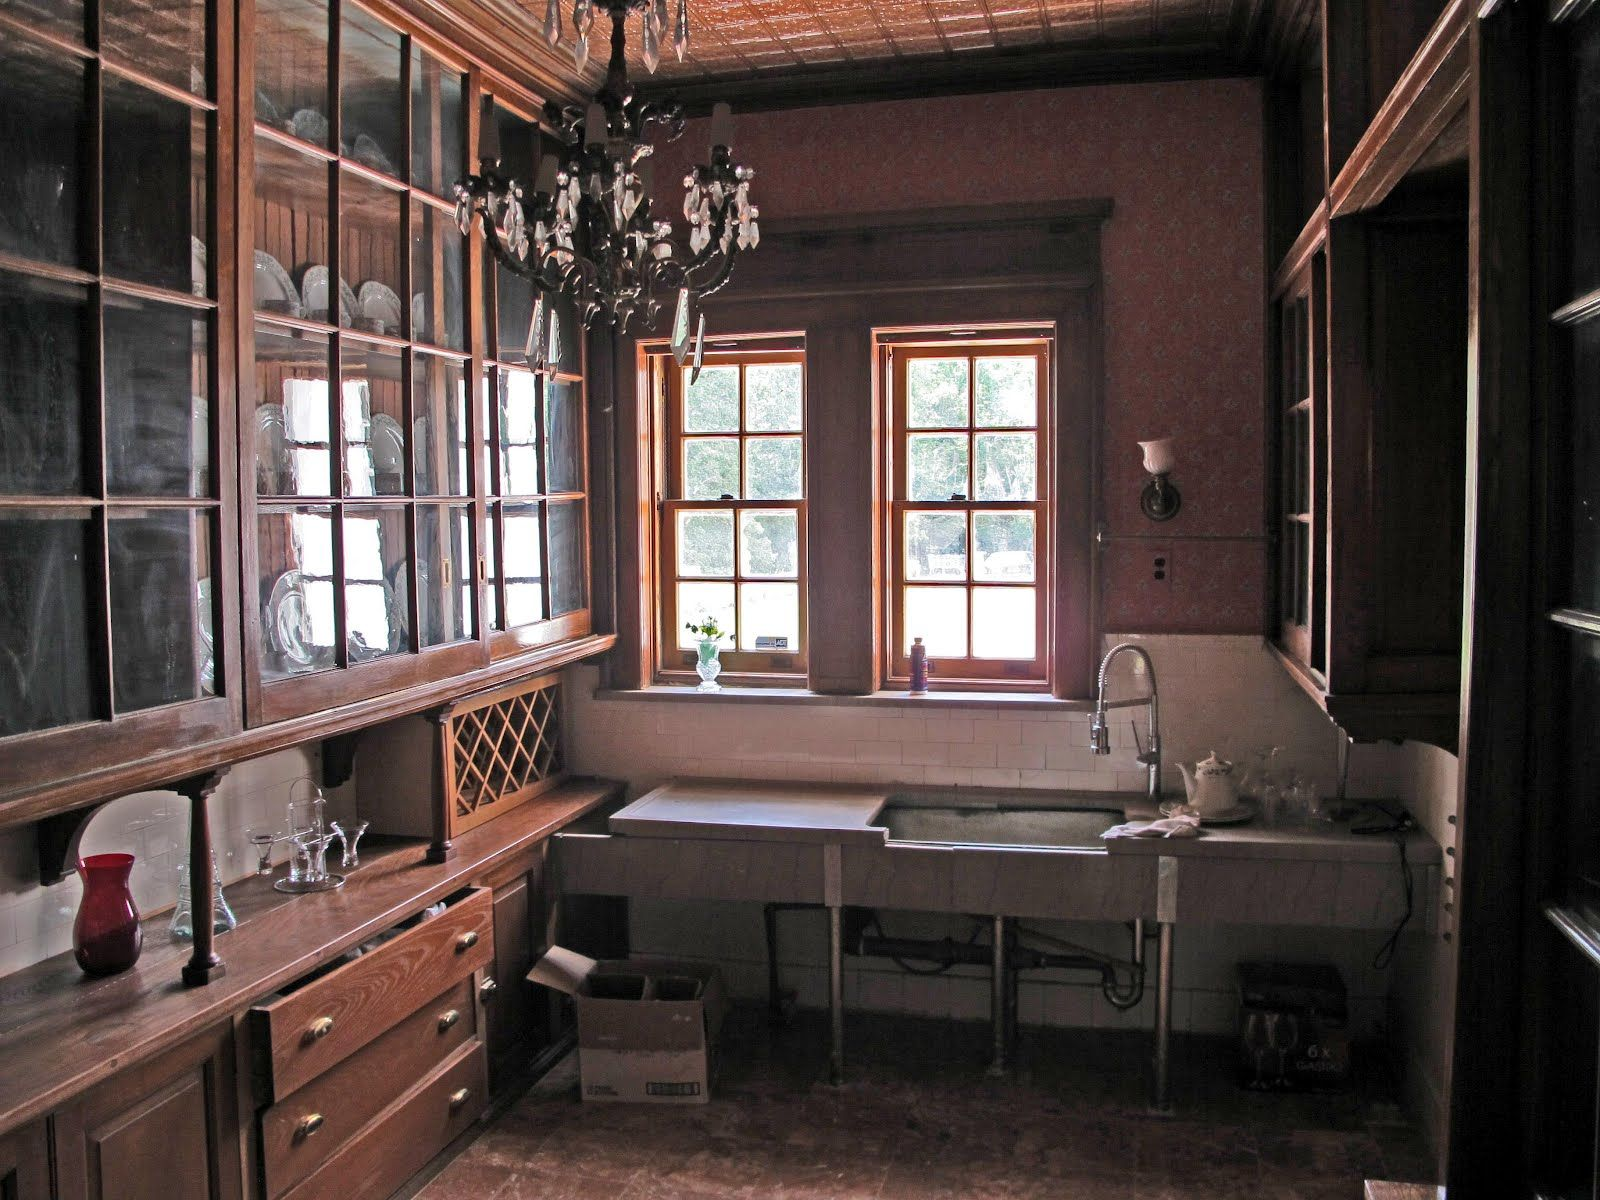 Big old Houses blog | pantry | Pinterest